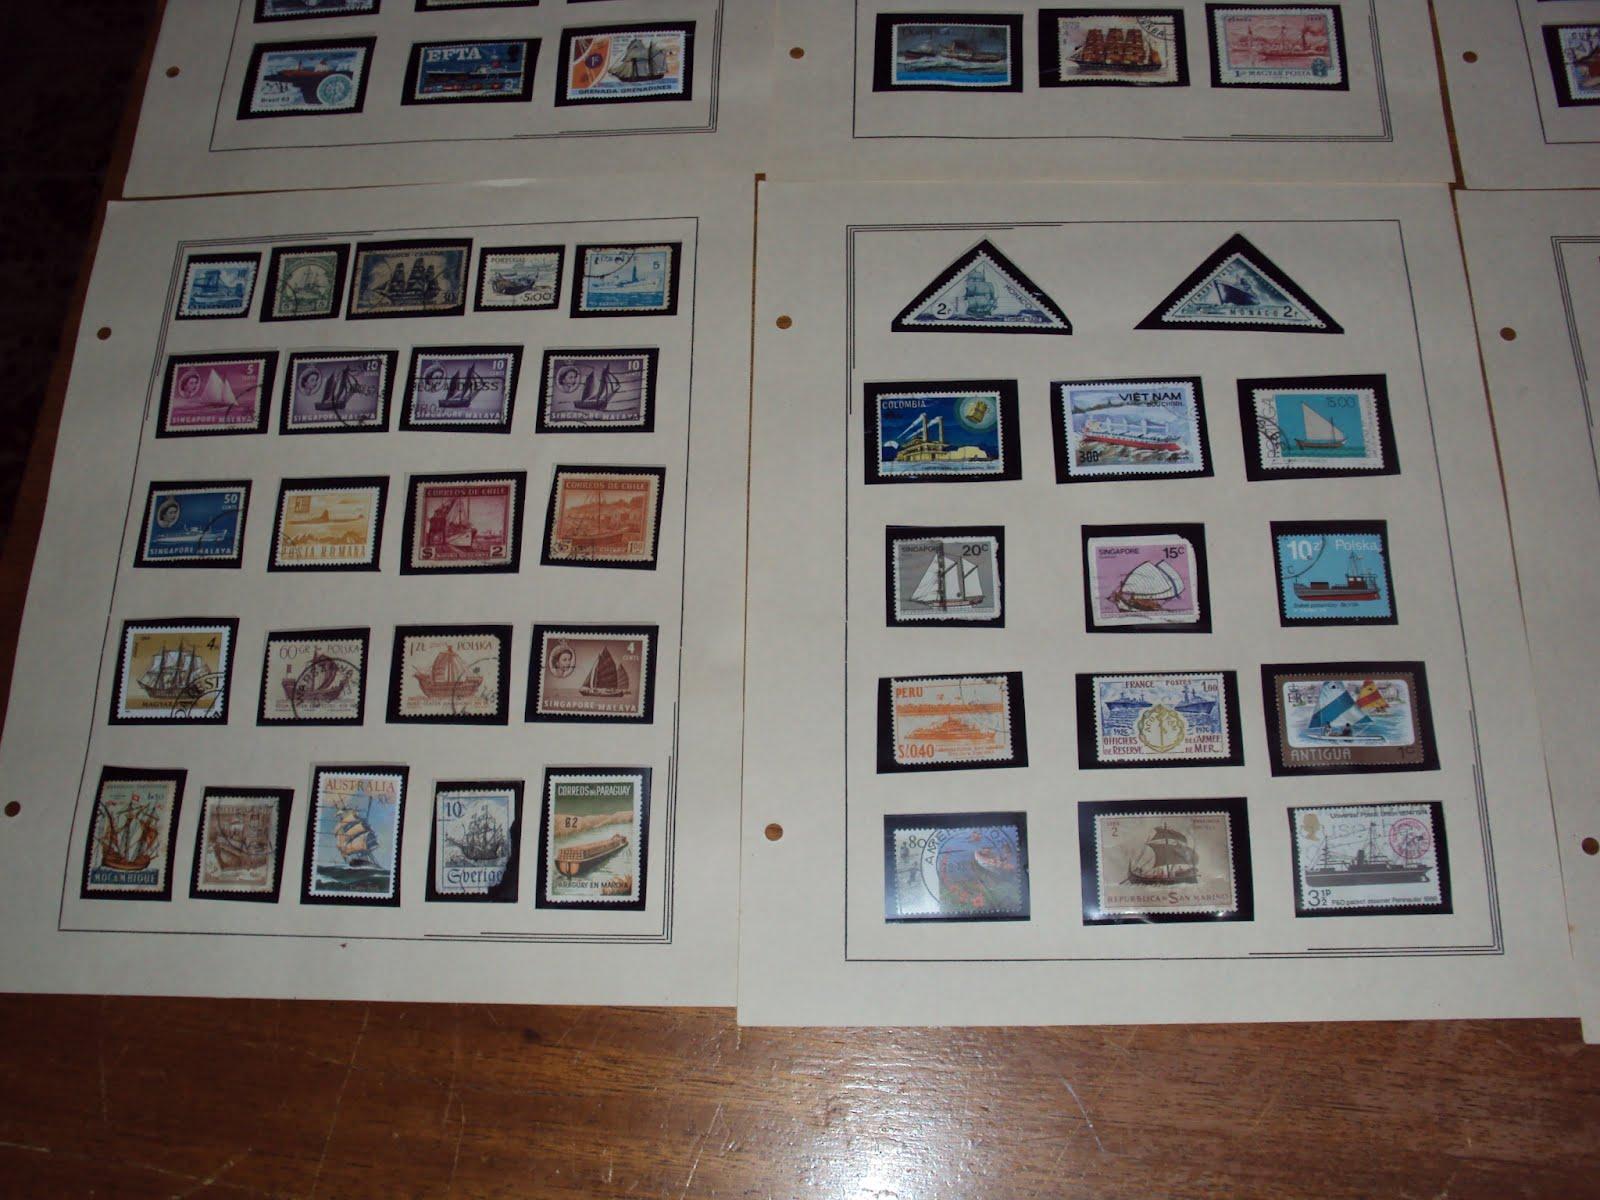 papeis+de+carta+e+selos+035.JPG (1600×1200)